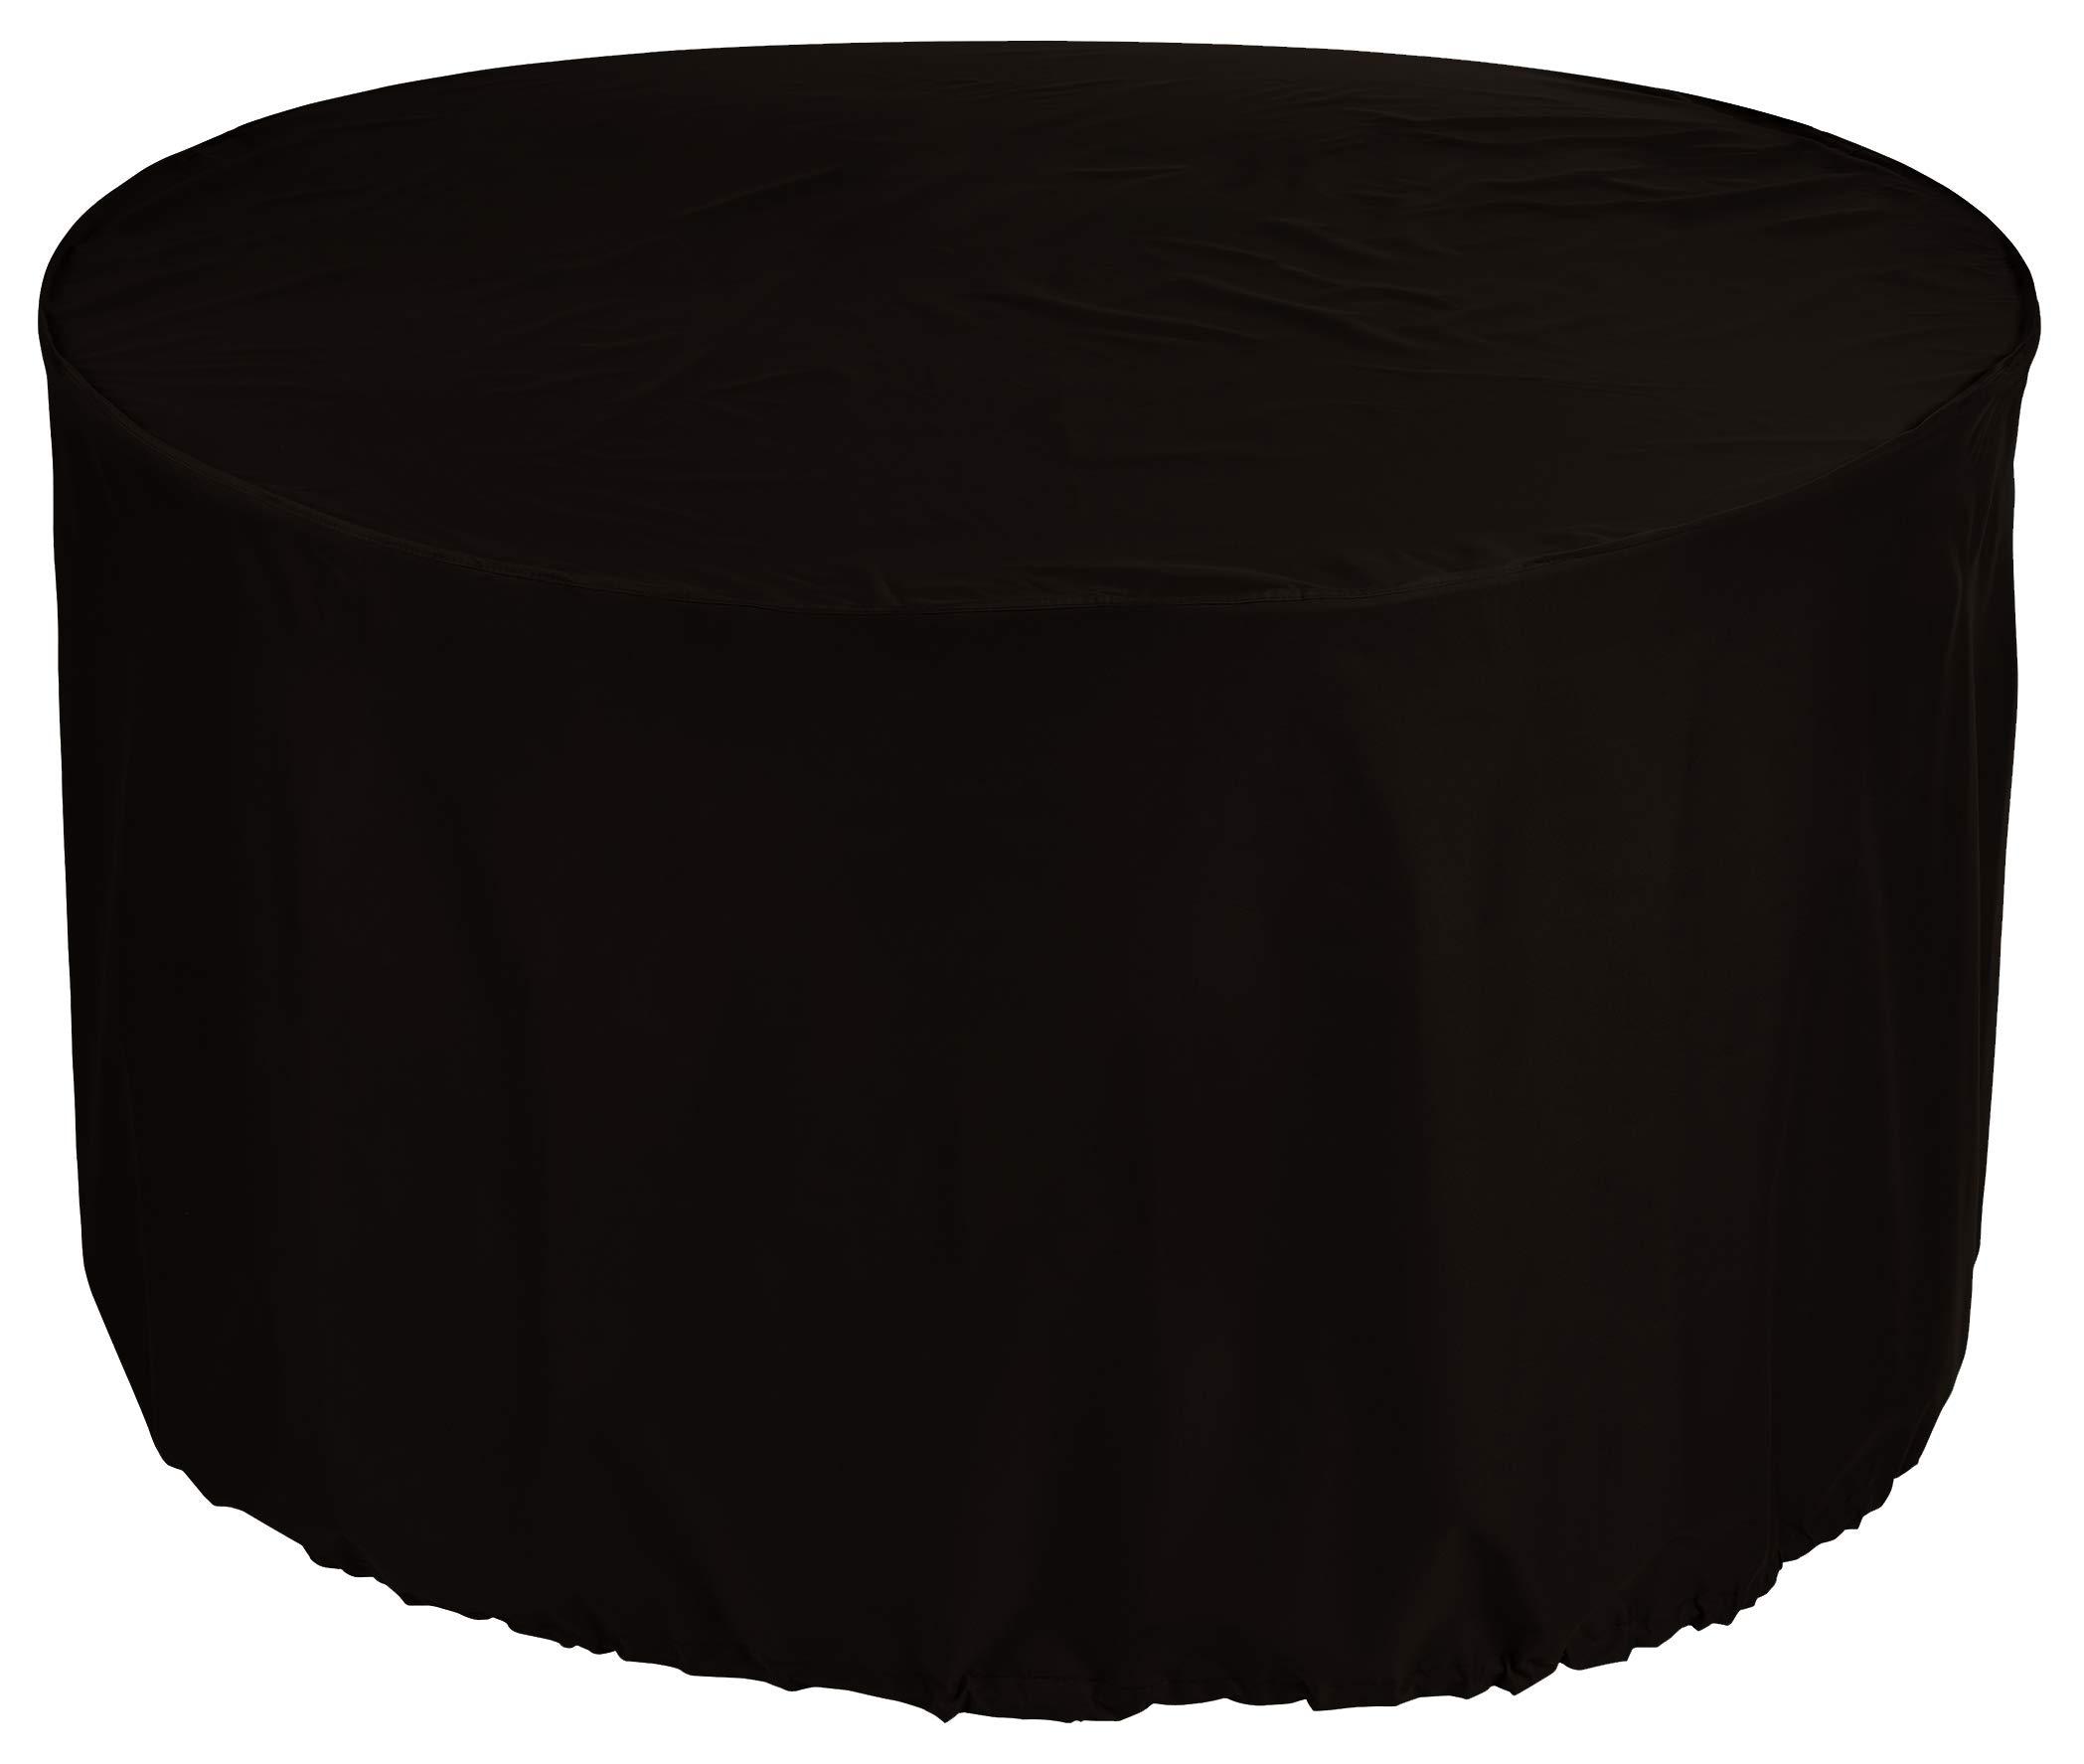 KaufPirat Premium Fundas para Mesa Redonda Ø 140x80 cm Cubierta Impermeable Funda para Mesa para Mobiliario de Exterior, Oxford Fundas para Proteger Muebles de Jardín Negro: Amazon.es: Jardín